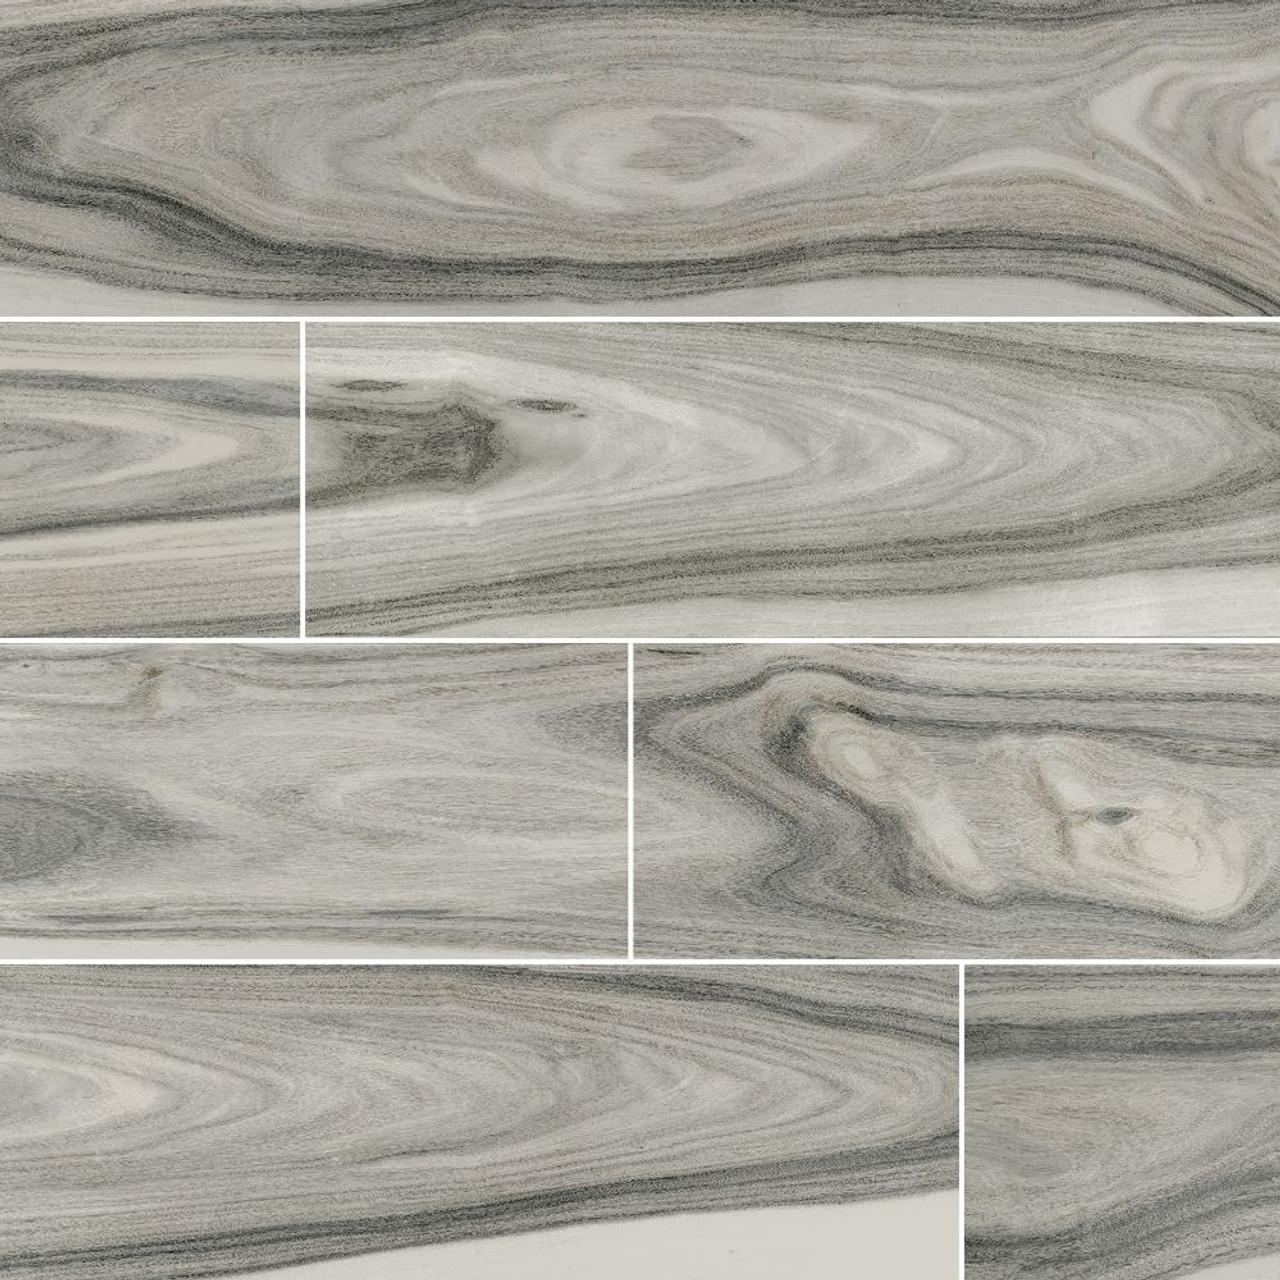 ms international dellano series moss grey 8x48 polished wood look porcelain tile ndelmosgrey8x48p